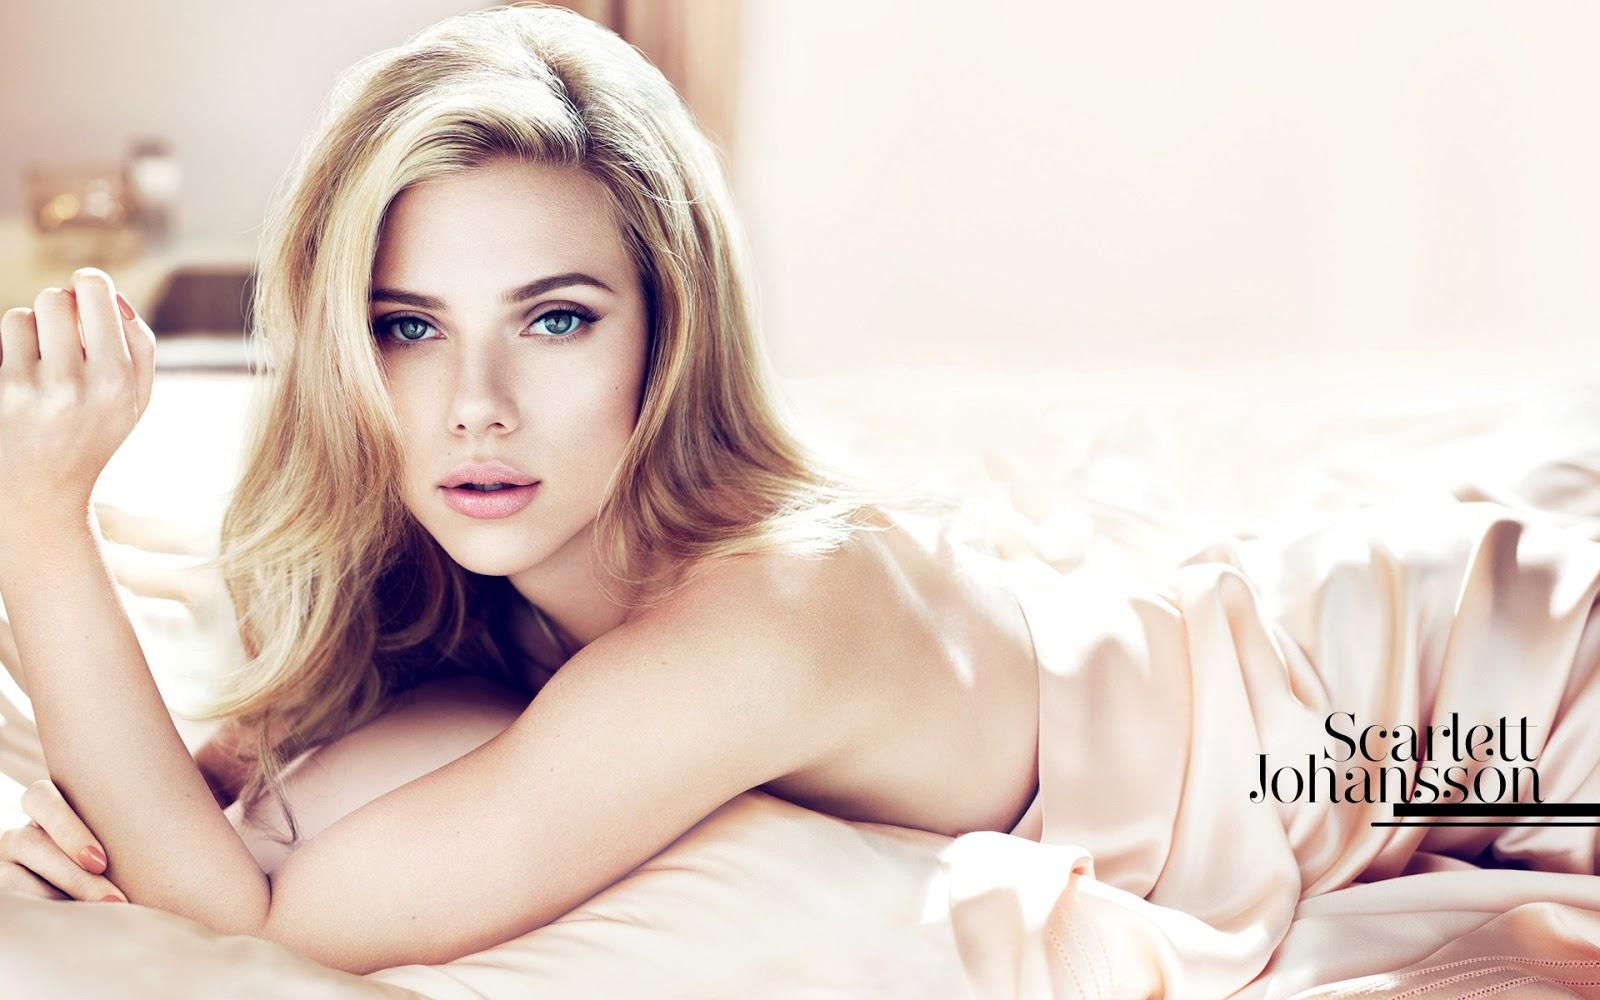 scarlett johansson hollywood actress hot and sexy